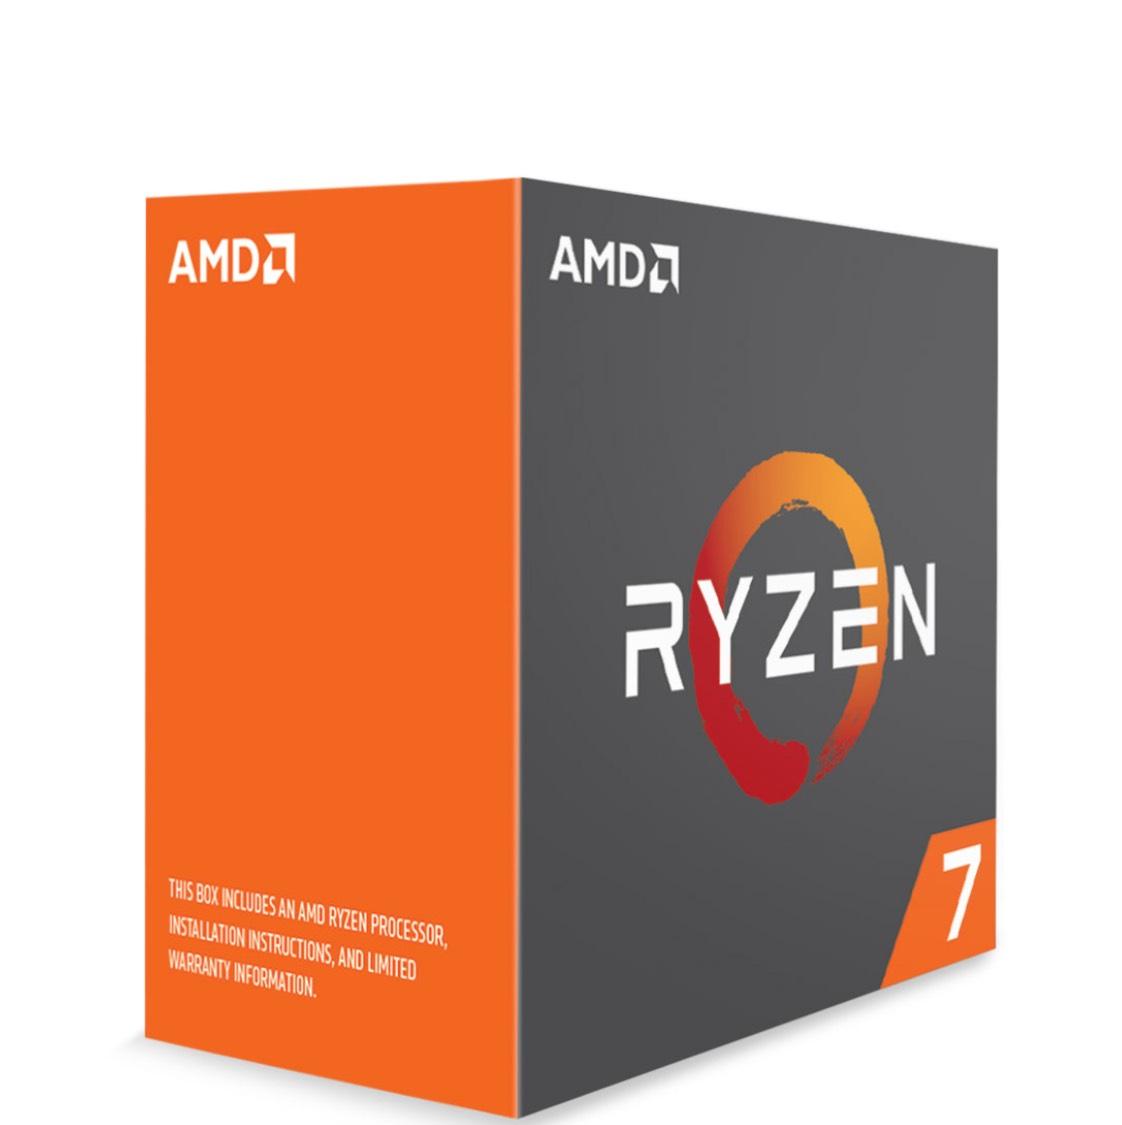 Processeur AMD Ryzen 7 1700X (3.4 GHz)